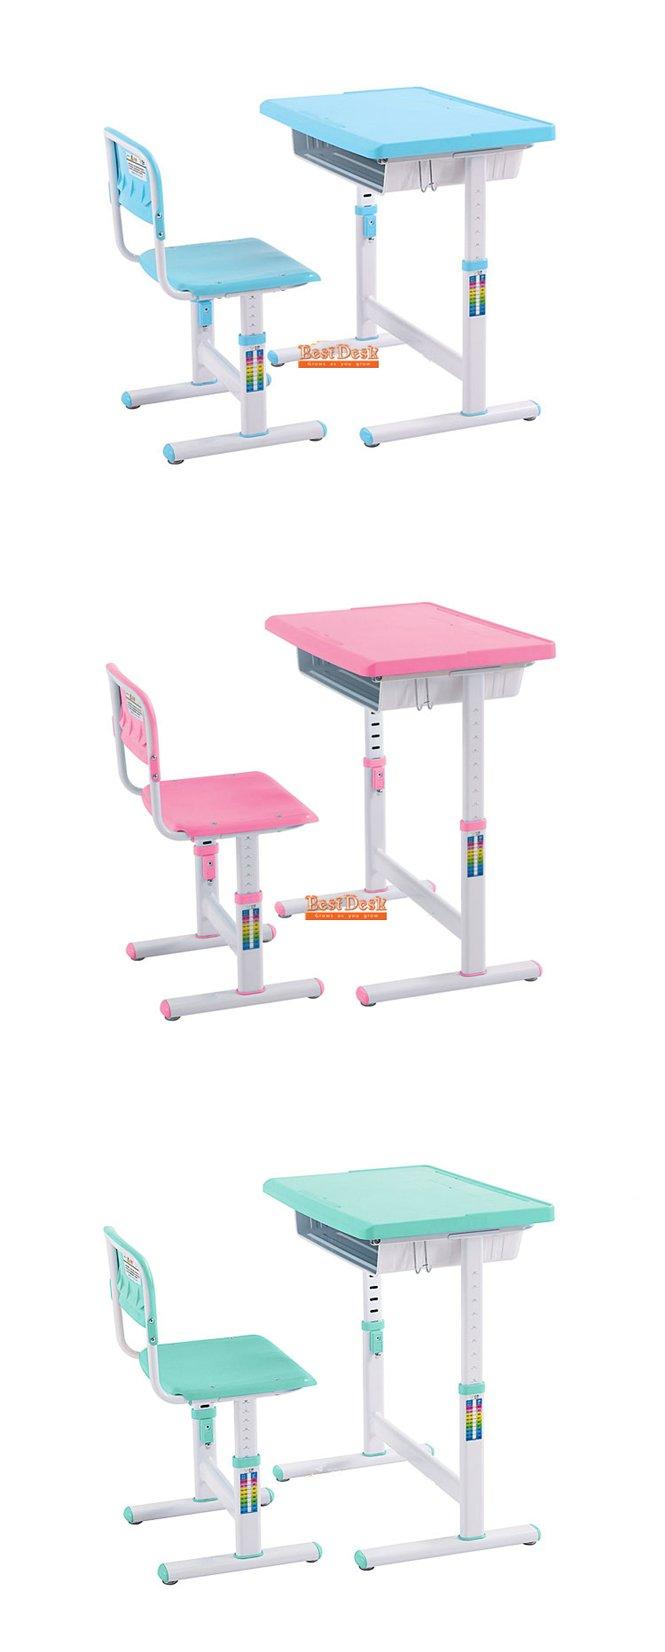 Best Desk height adjustable kids desk chair Mini range has tilt desktop and bright colours in pink green and blue